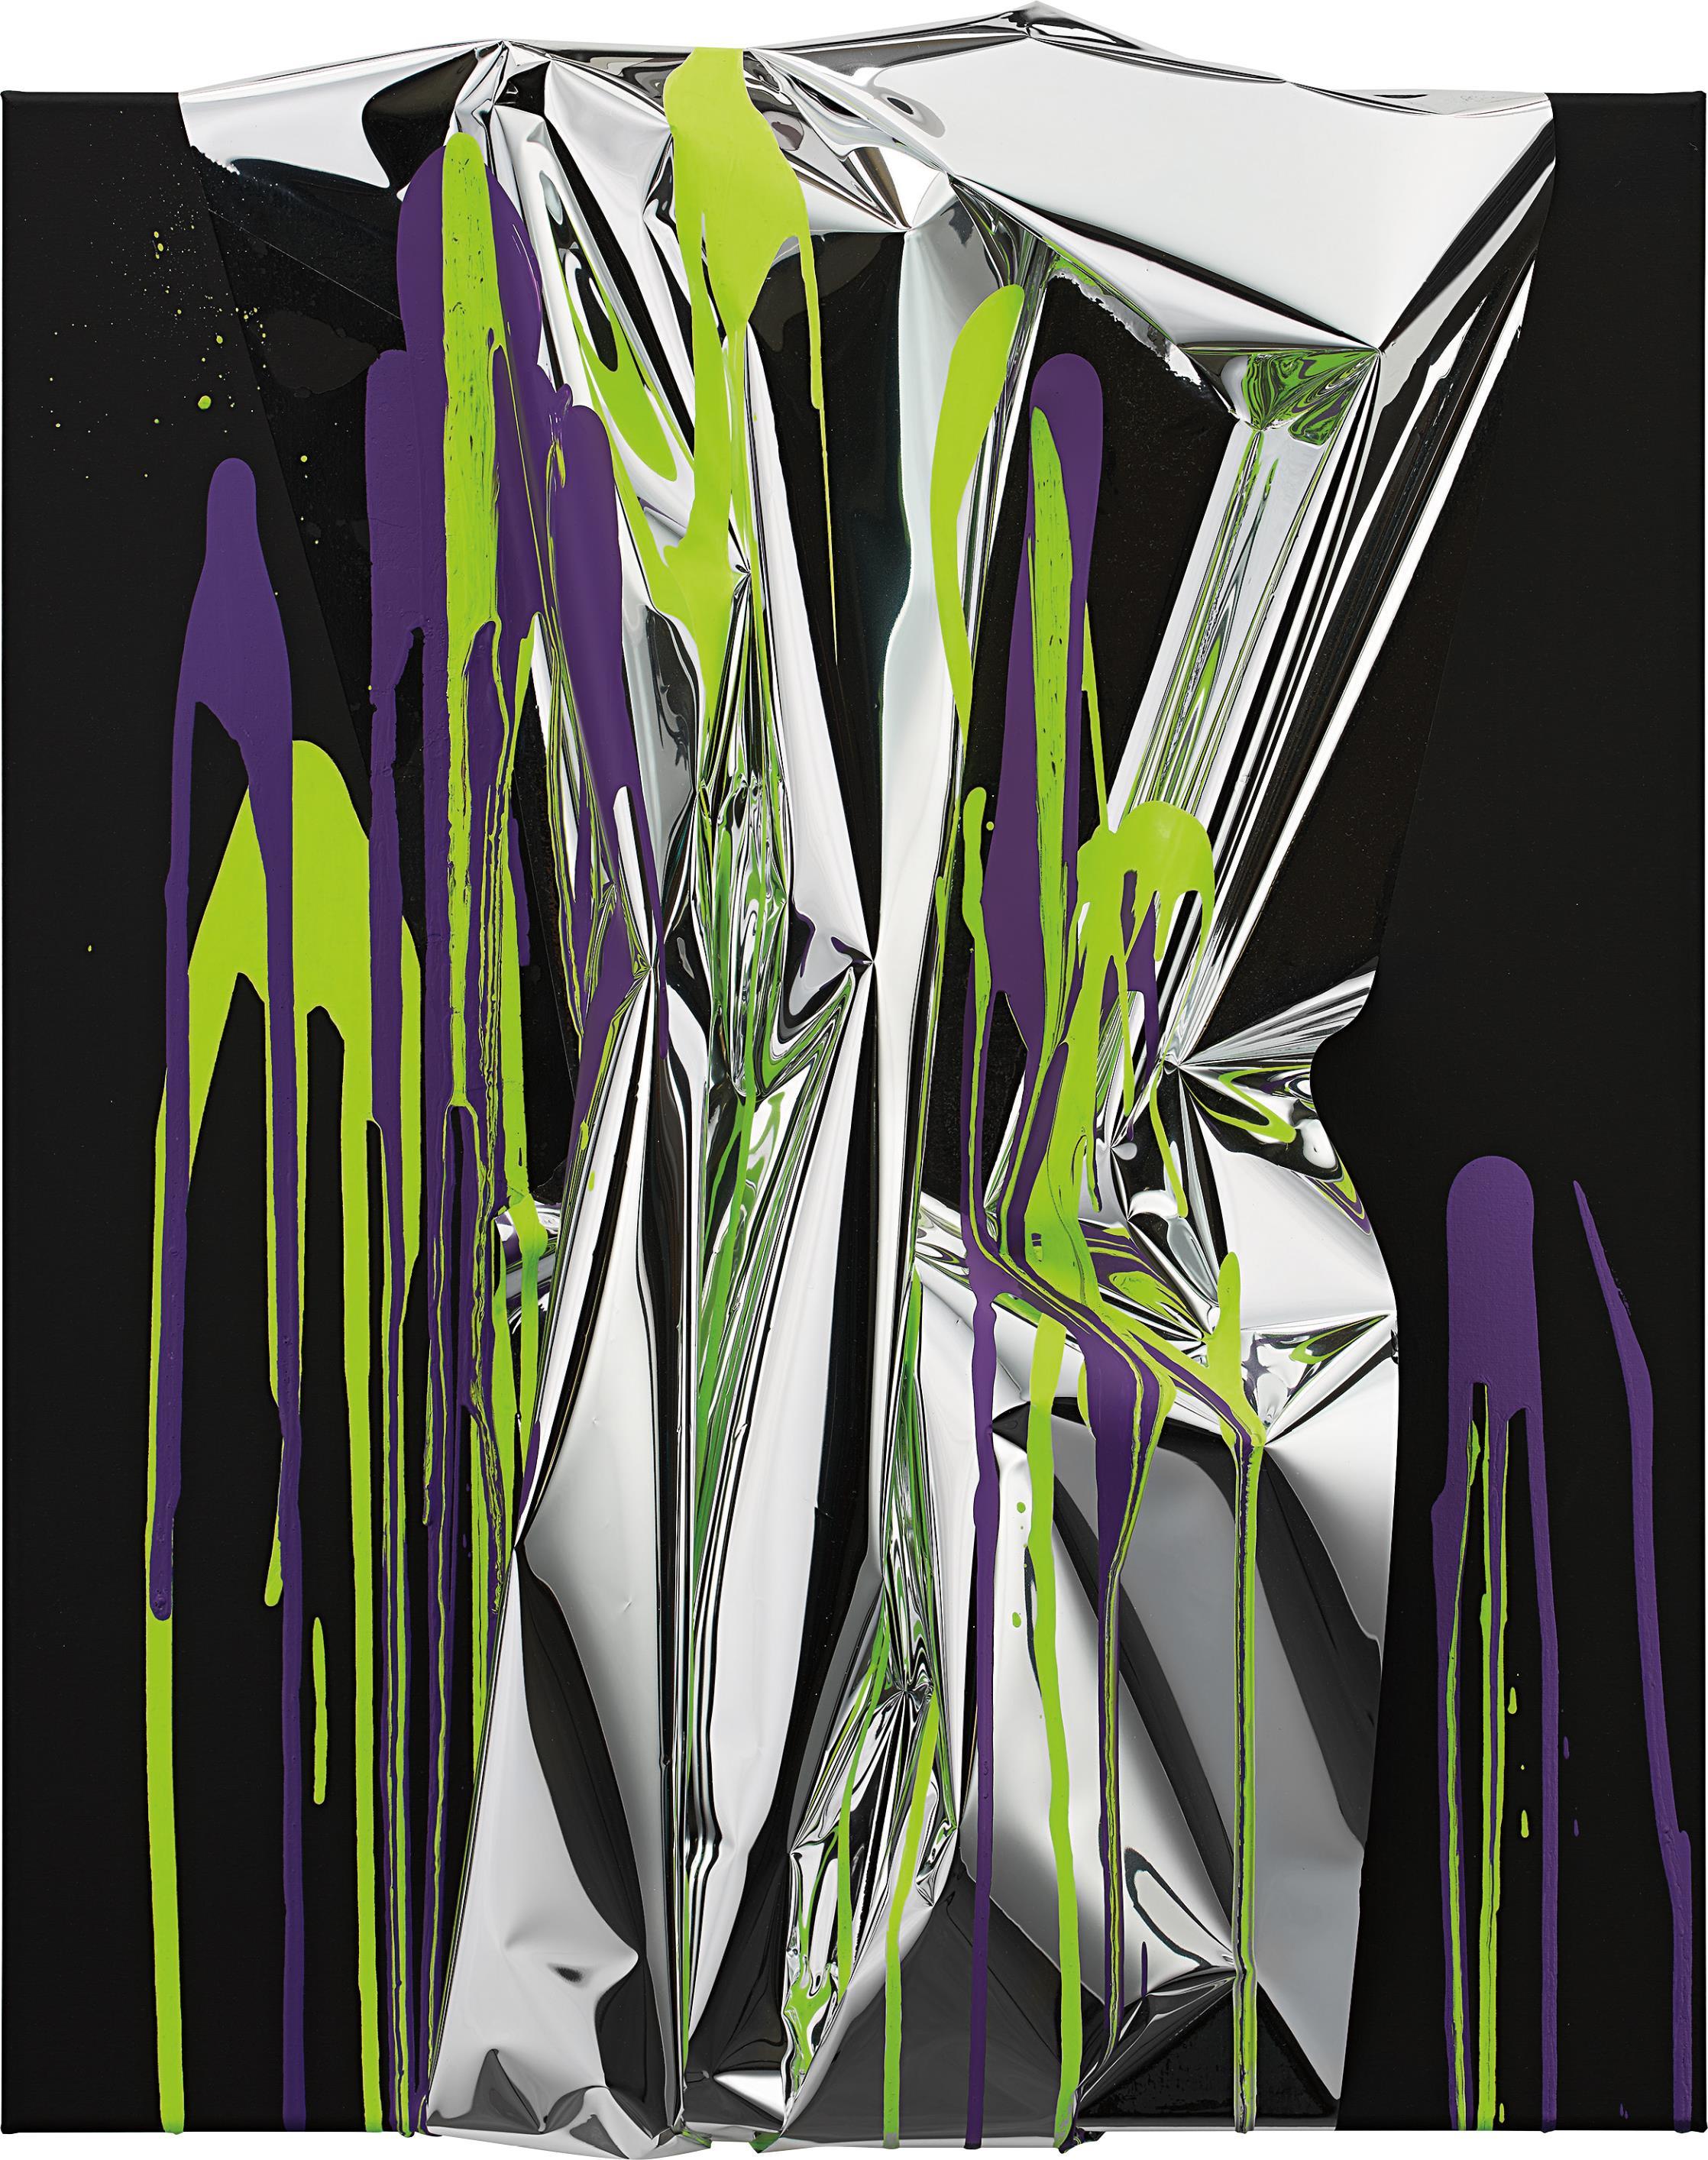 Anselm Reyle-Untitled-2008